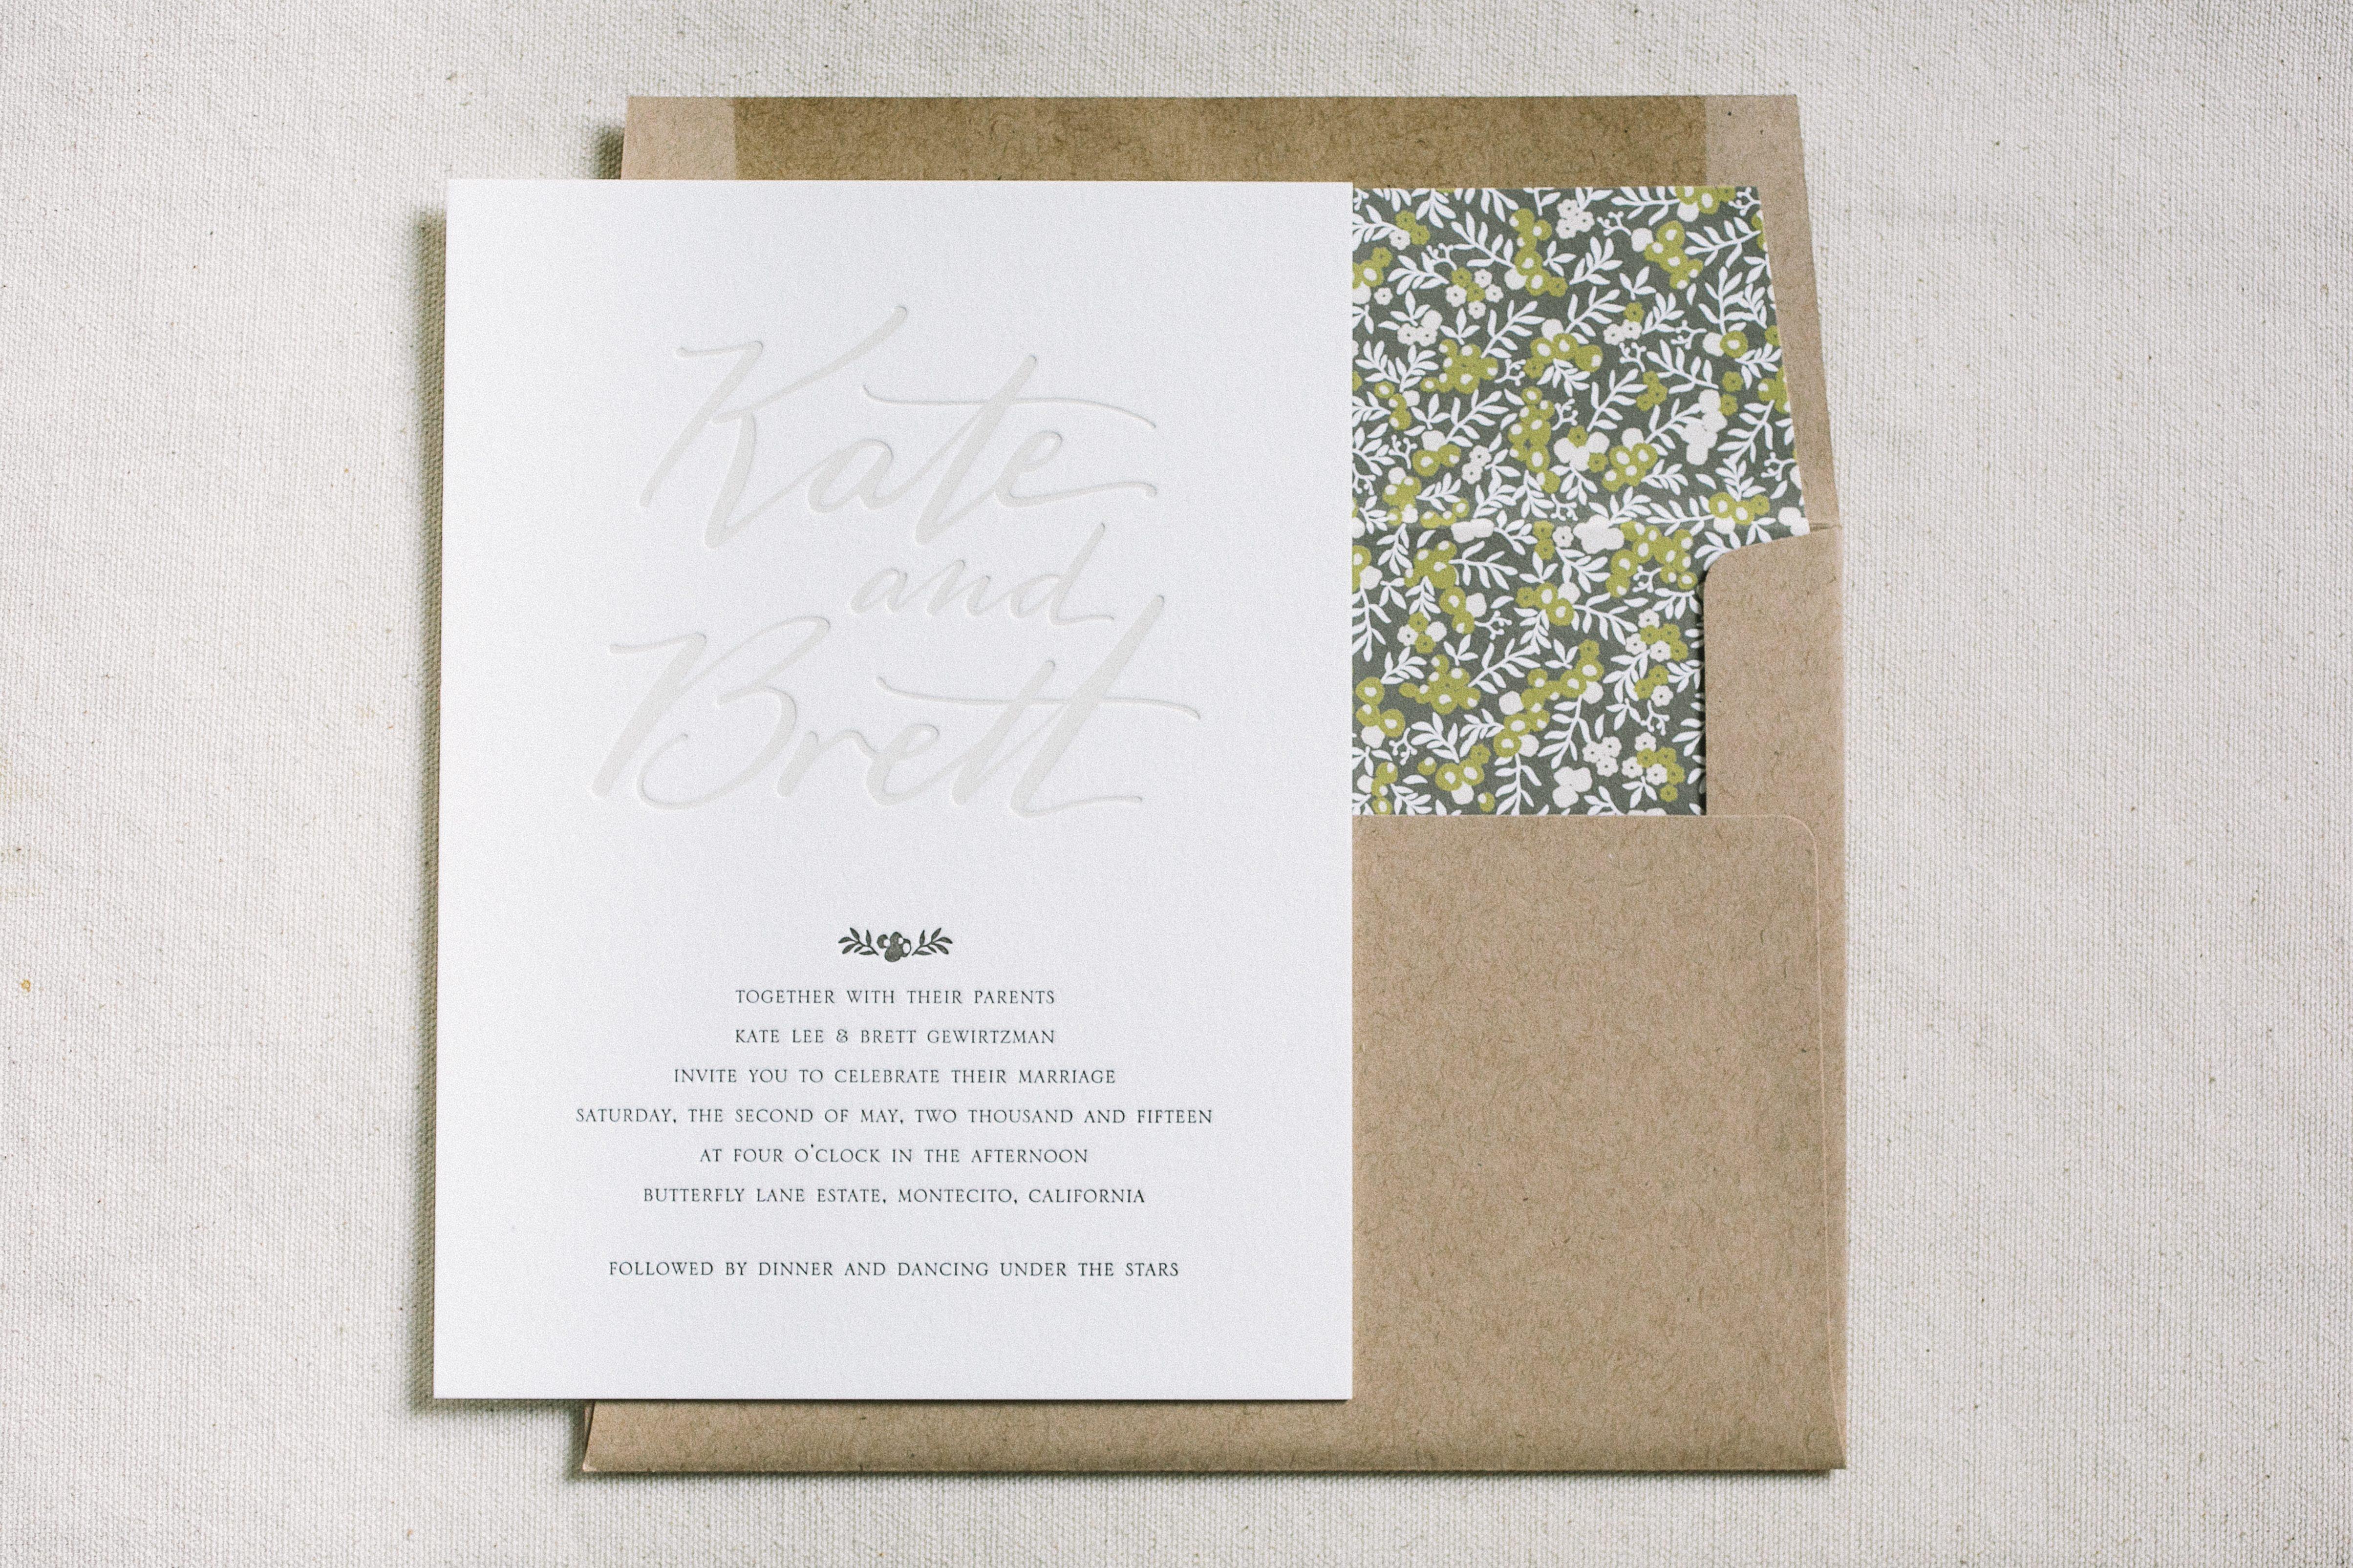 Customized Wedding Invitations: Custom Wedding Invitations Featuring Hand Calligraphy